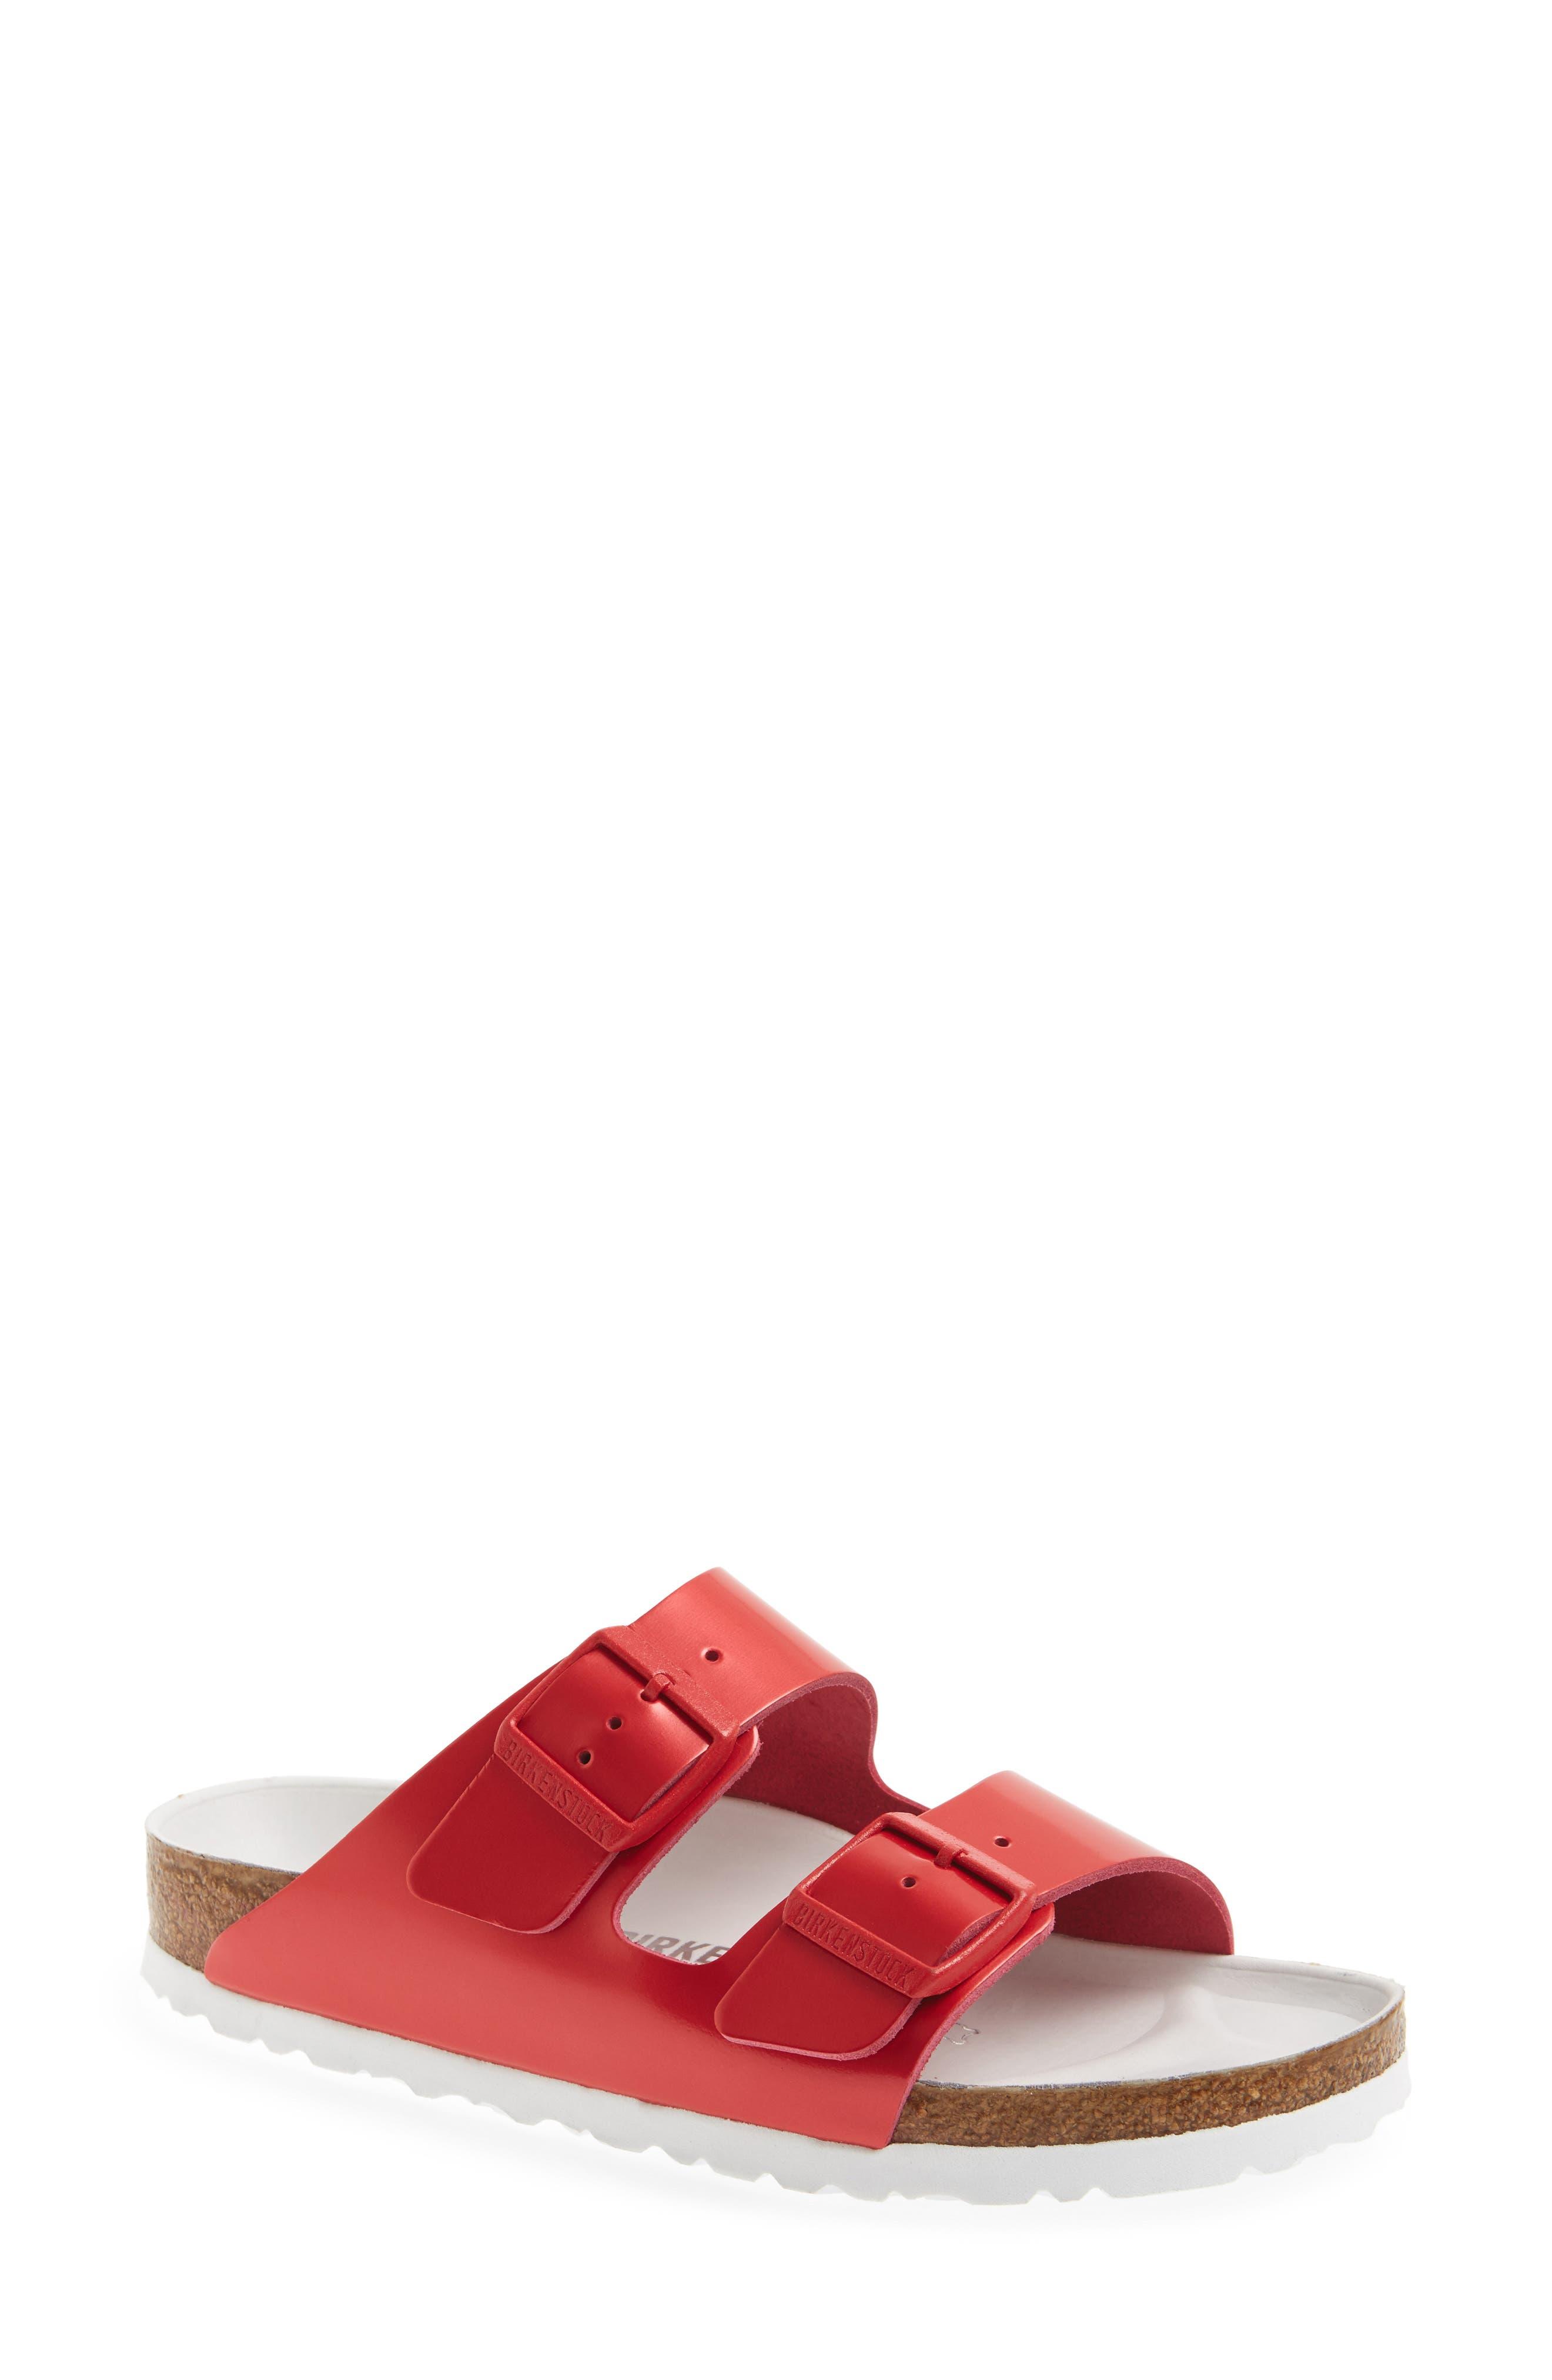 Birkenstock Arizona Hex Limited Edition - Shock Drop Slide Sandal (Women)